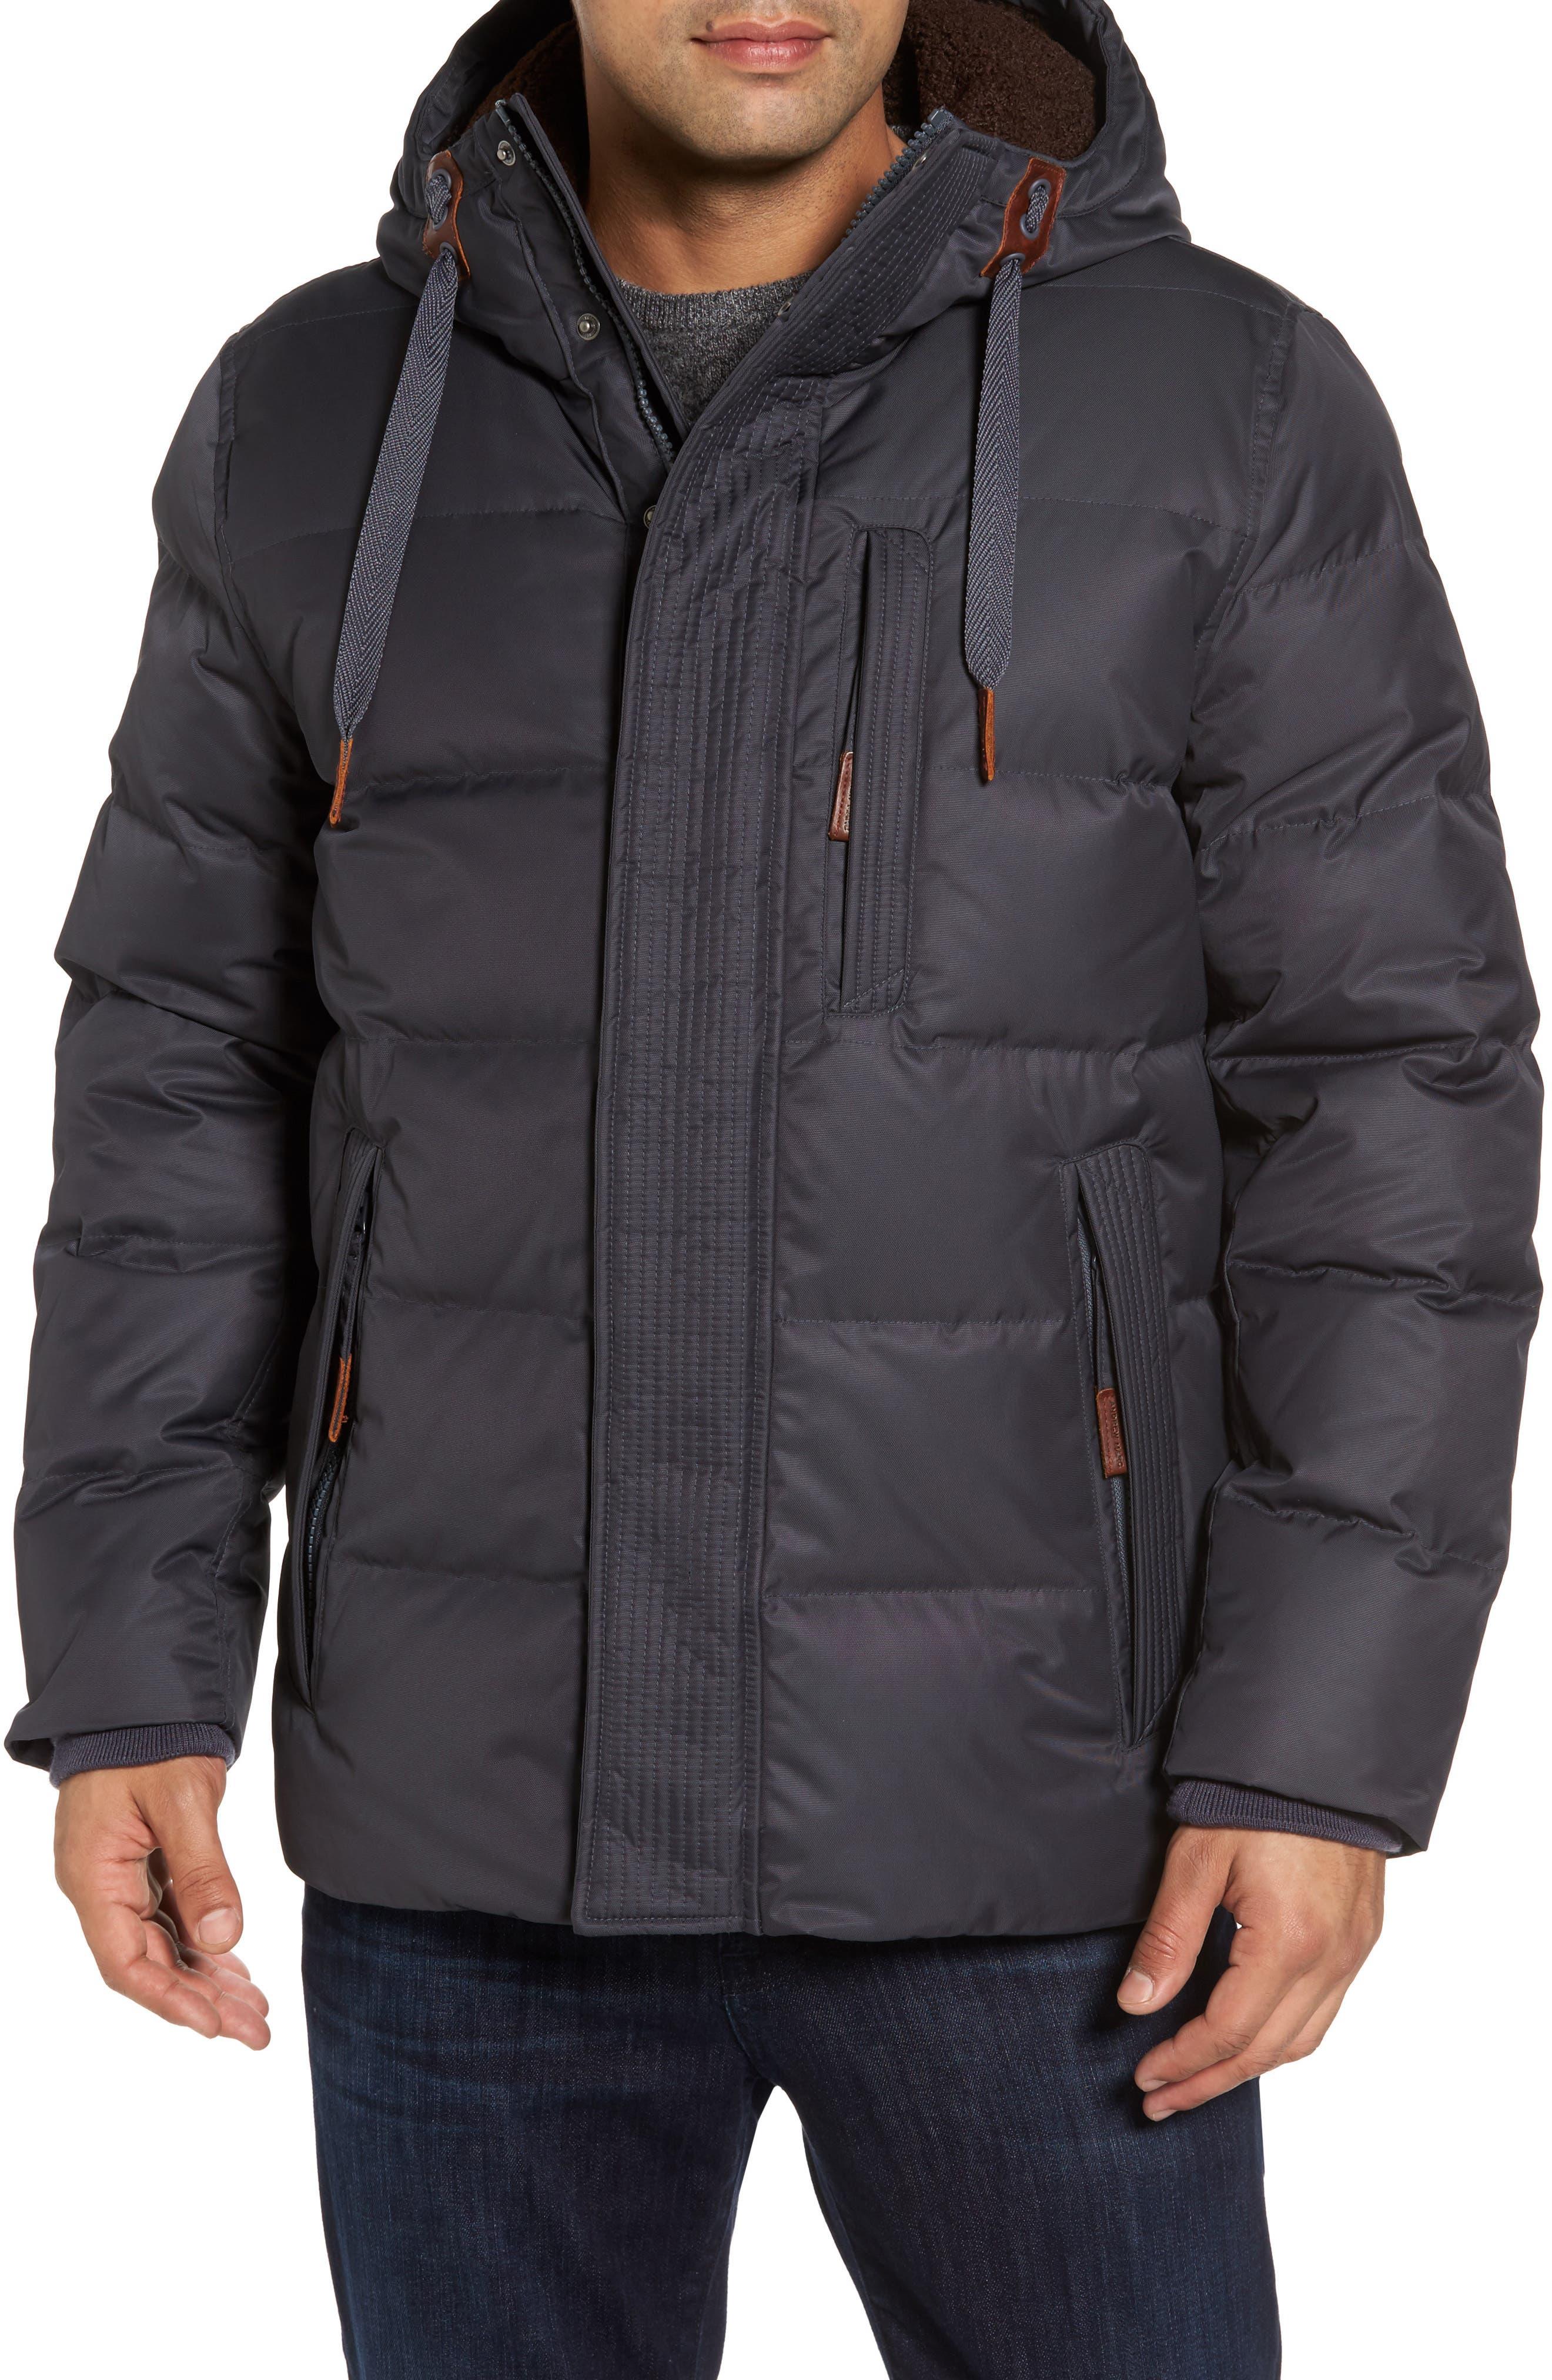 Groton Slim Down Jacket with Faux Shearling Lining,                             Main thumbnail 2, color,